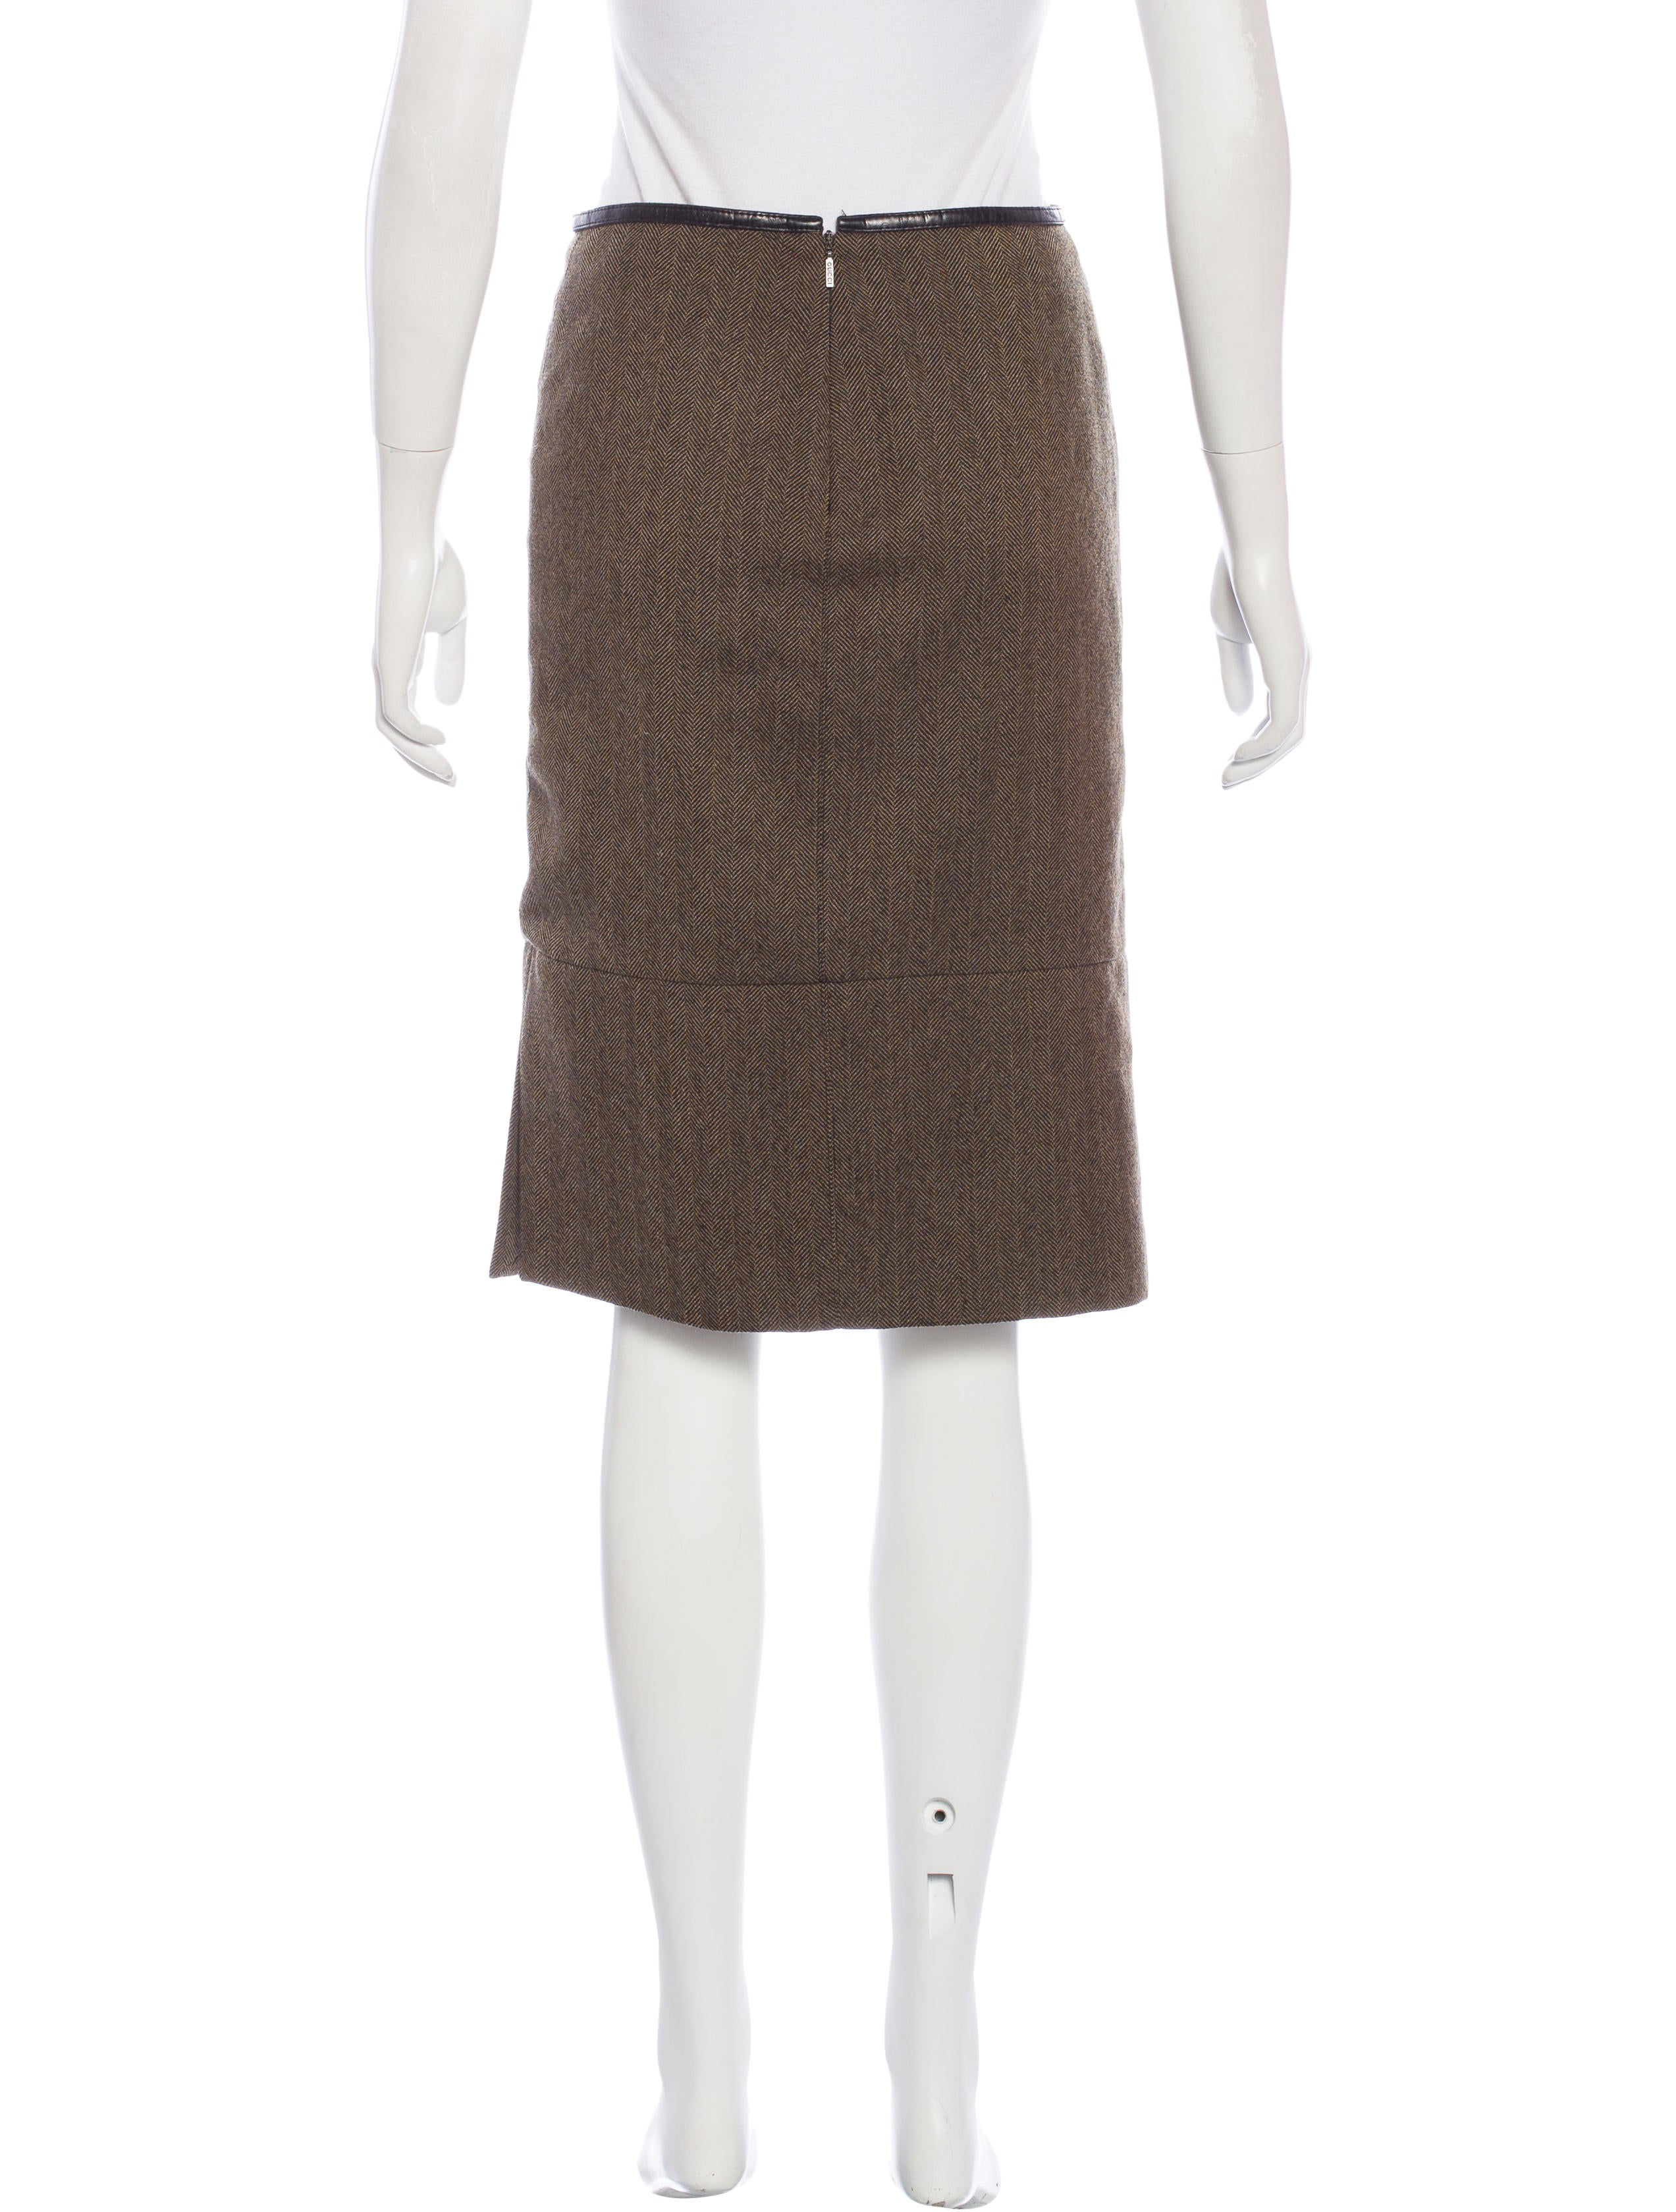 Gucci Wool Pencil Skirt - Clothing - GUC136397 | The RealReal